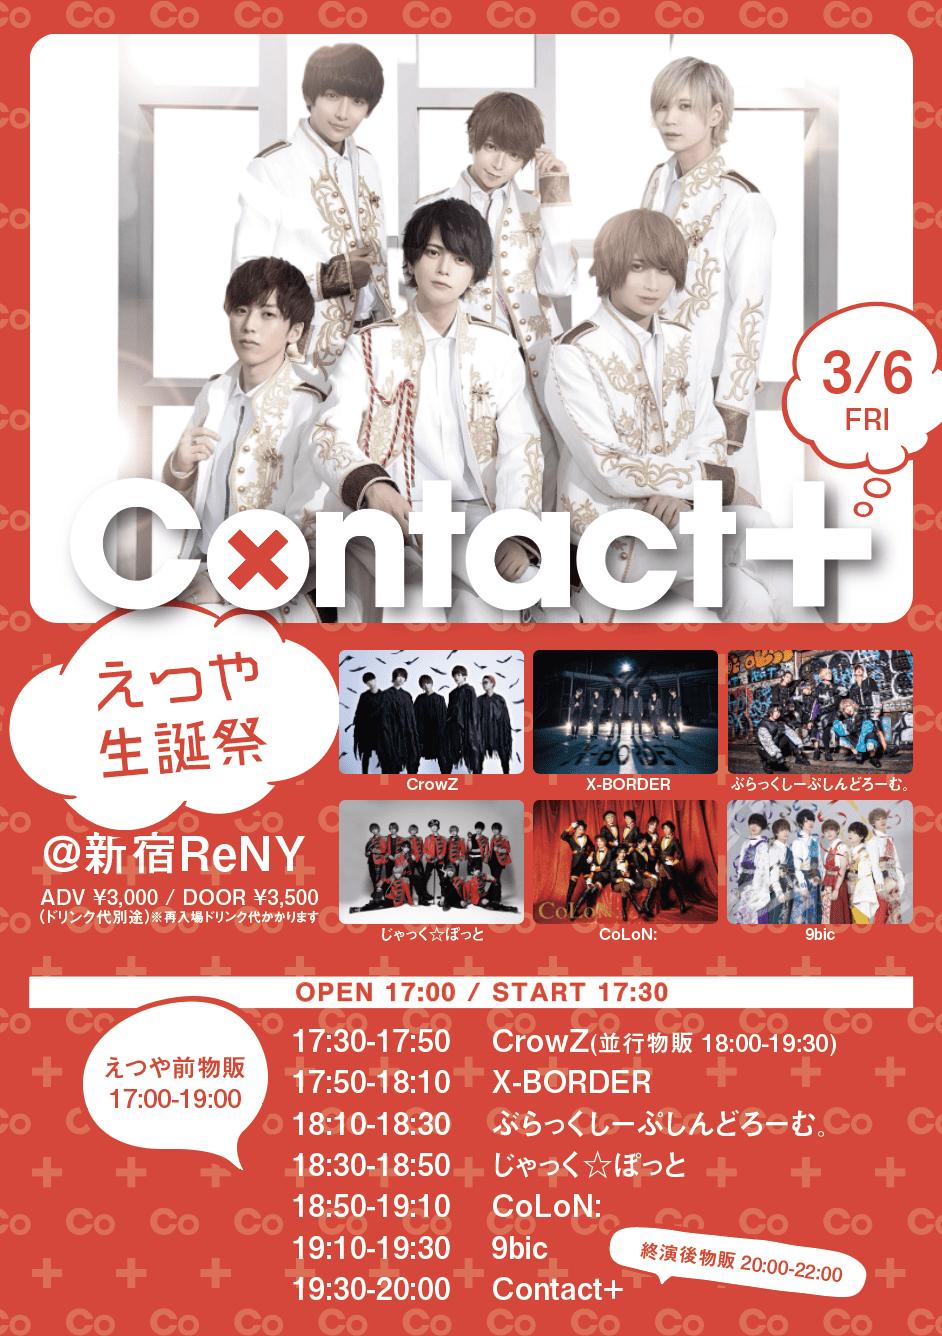 Contact+えつや生誕祭